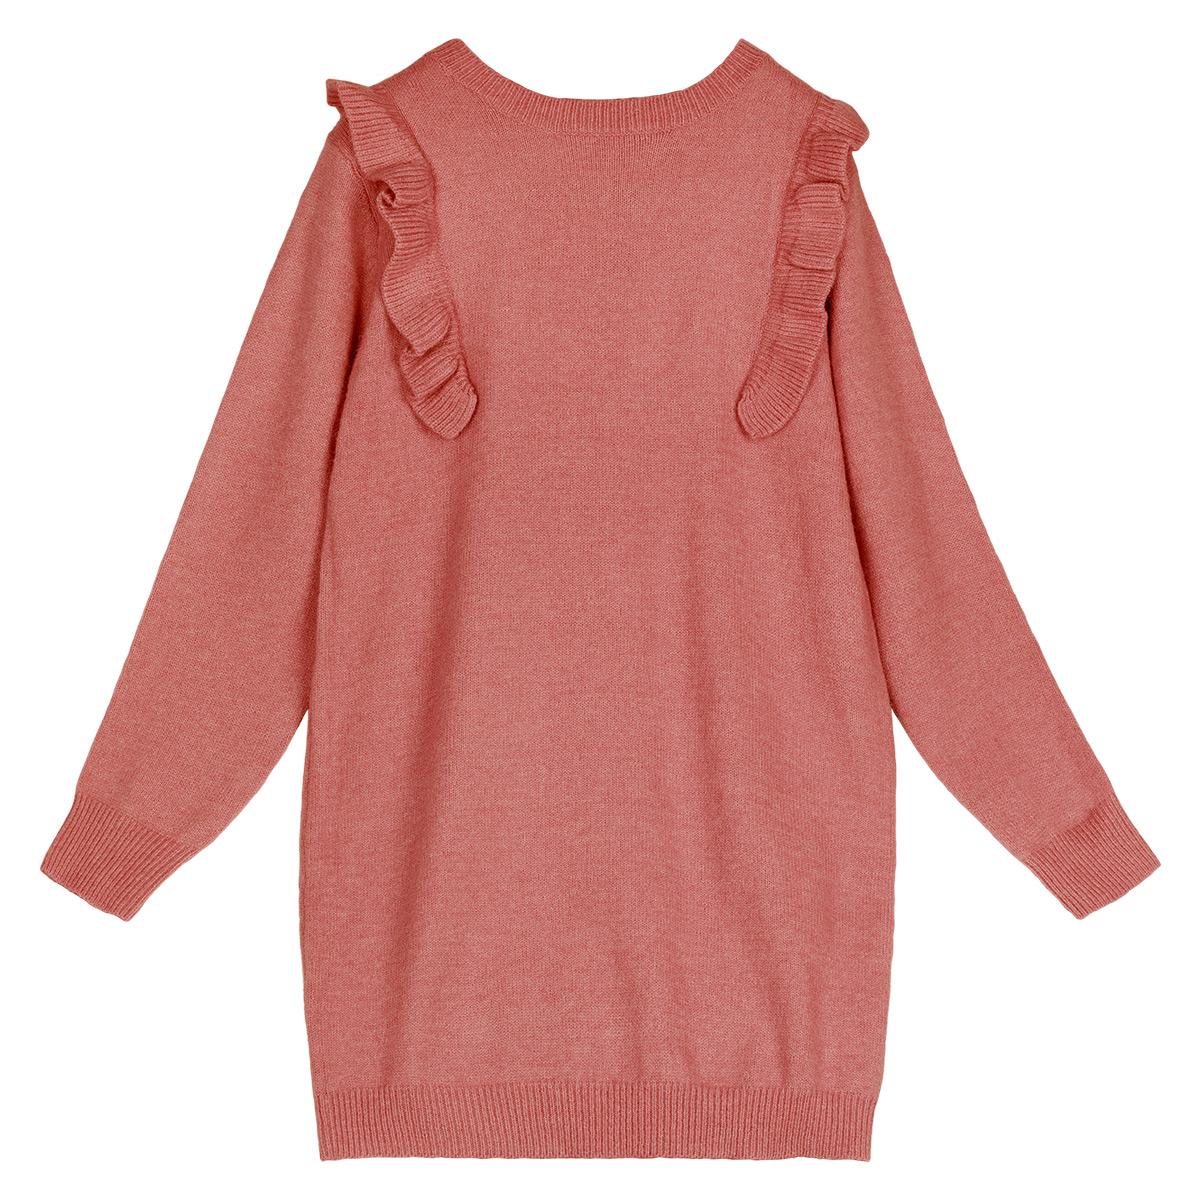 Sweater dress ruffles